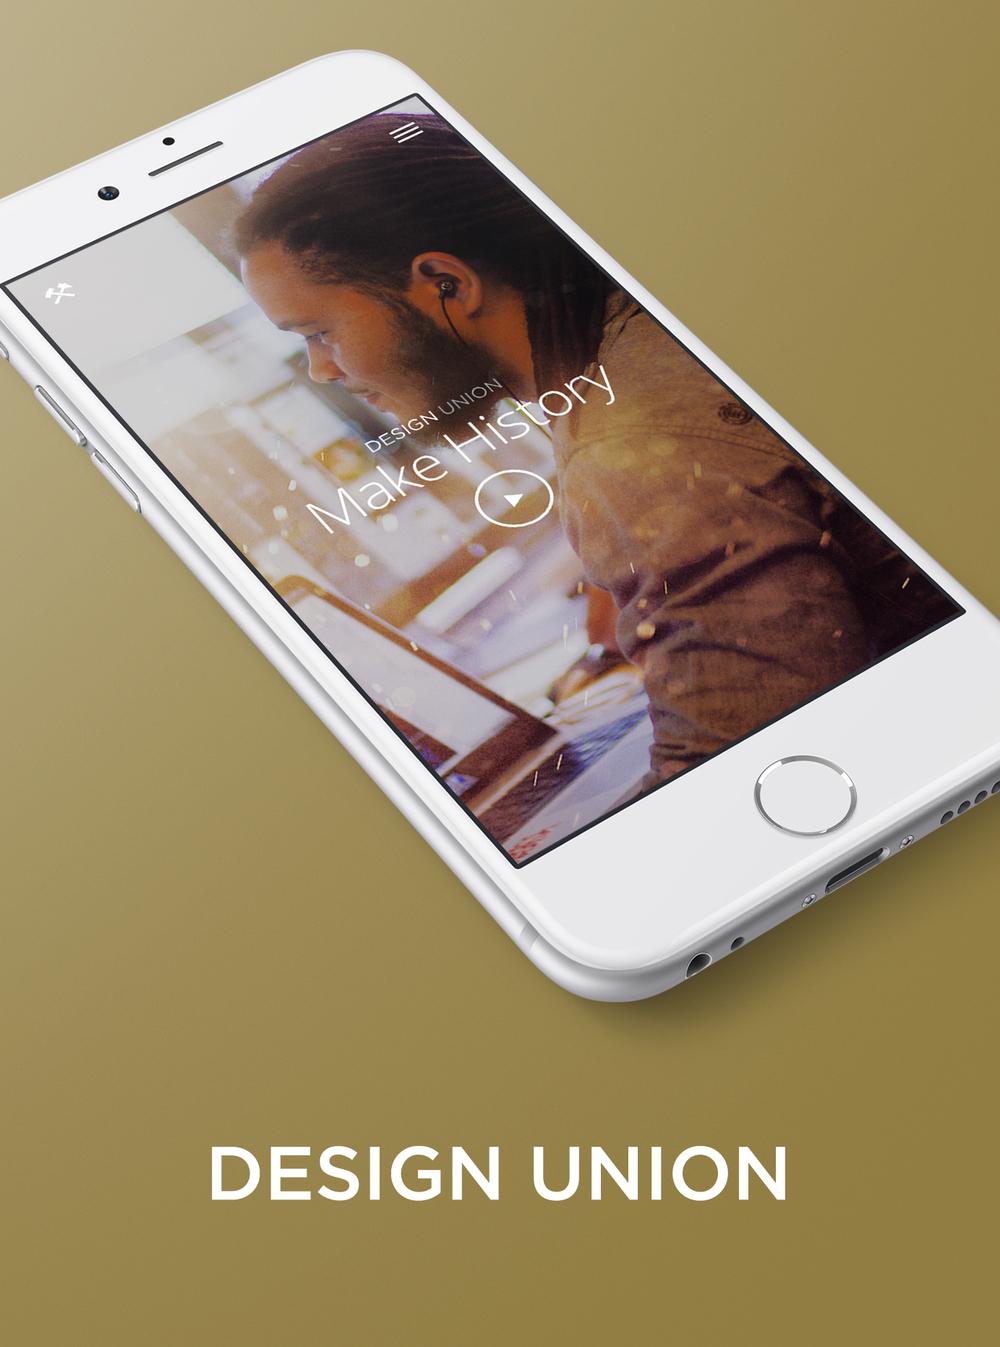 designunion.jpg